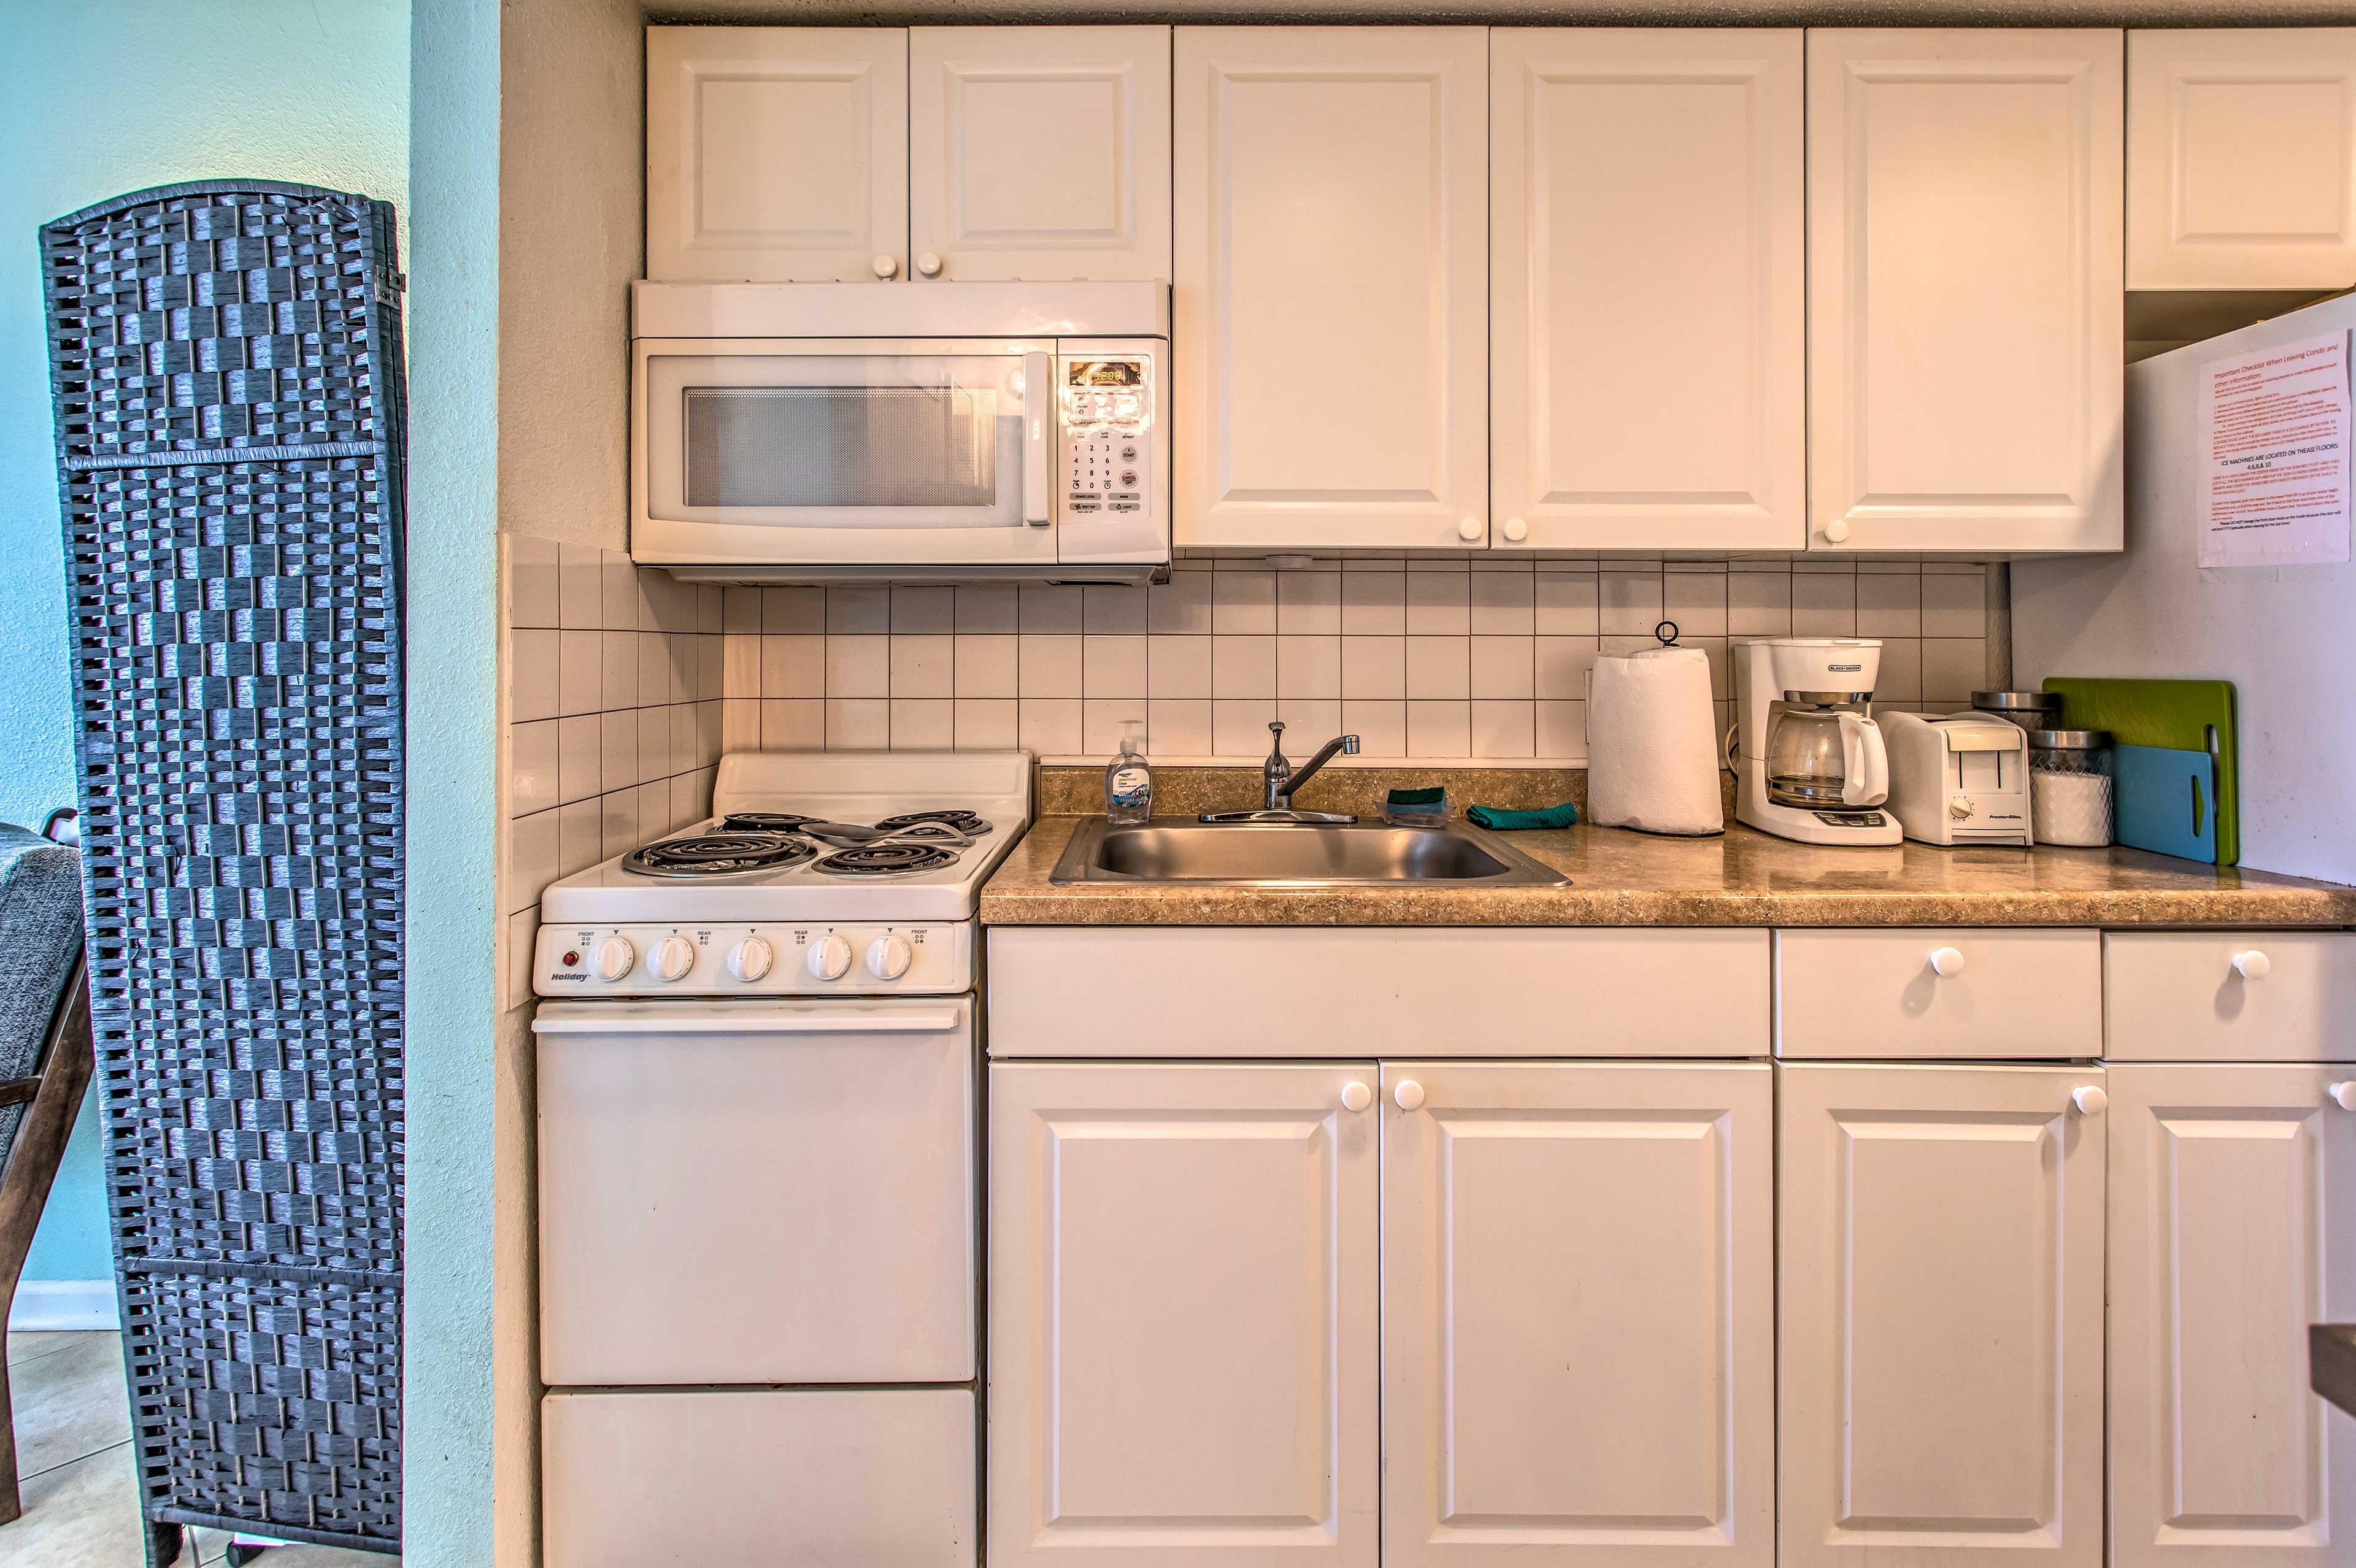 Kitchen | Cooking Basics | Drip Coffee Maker